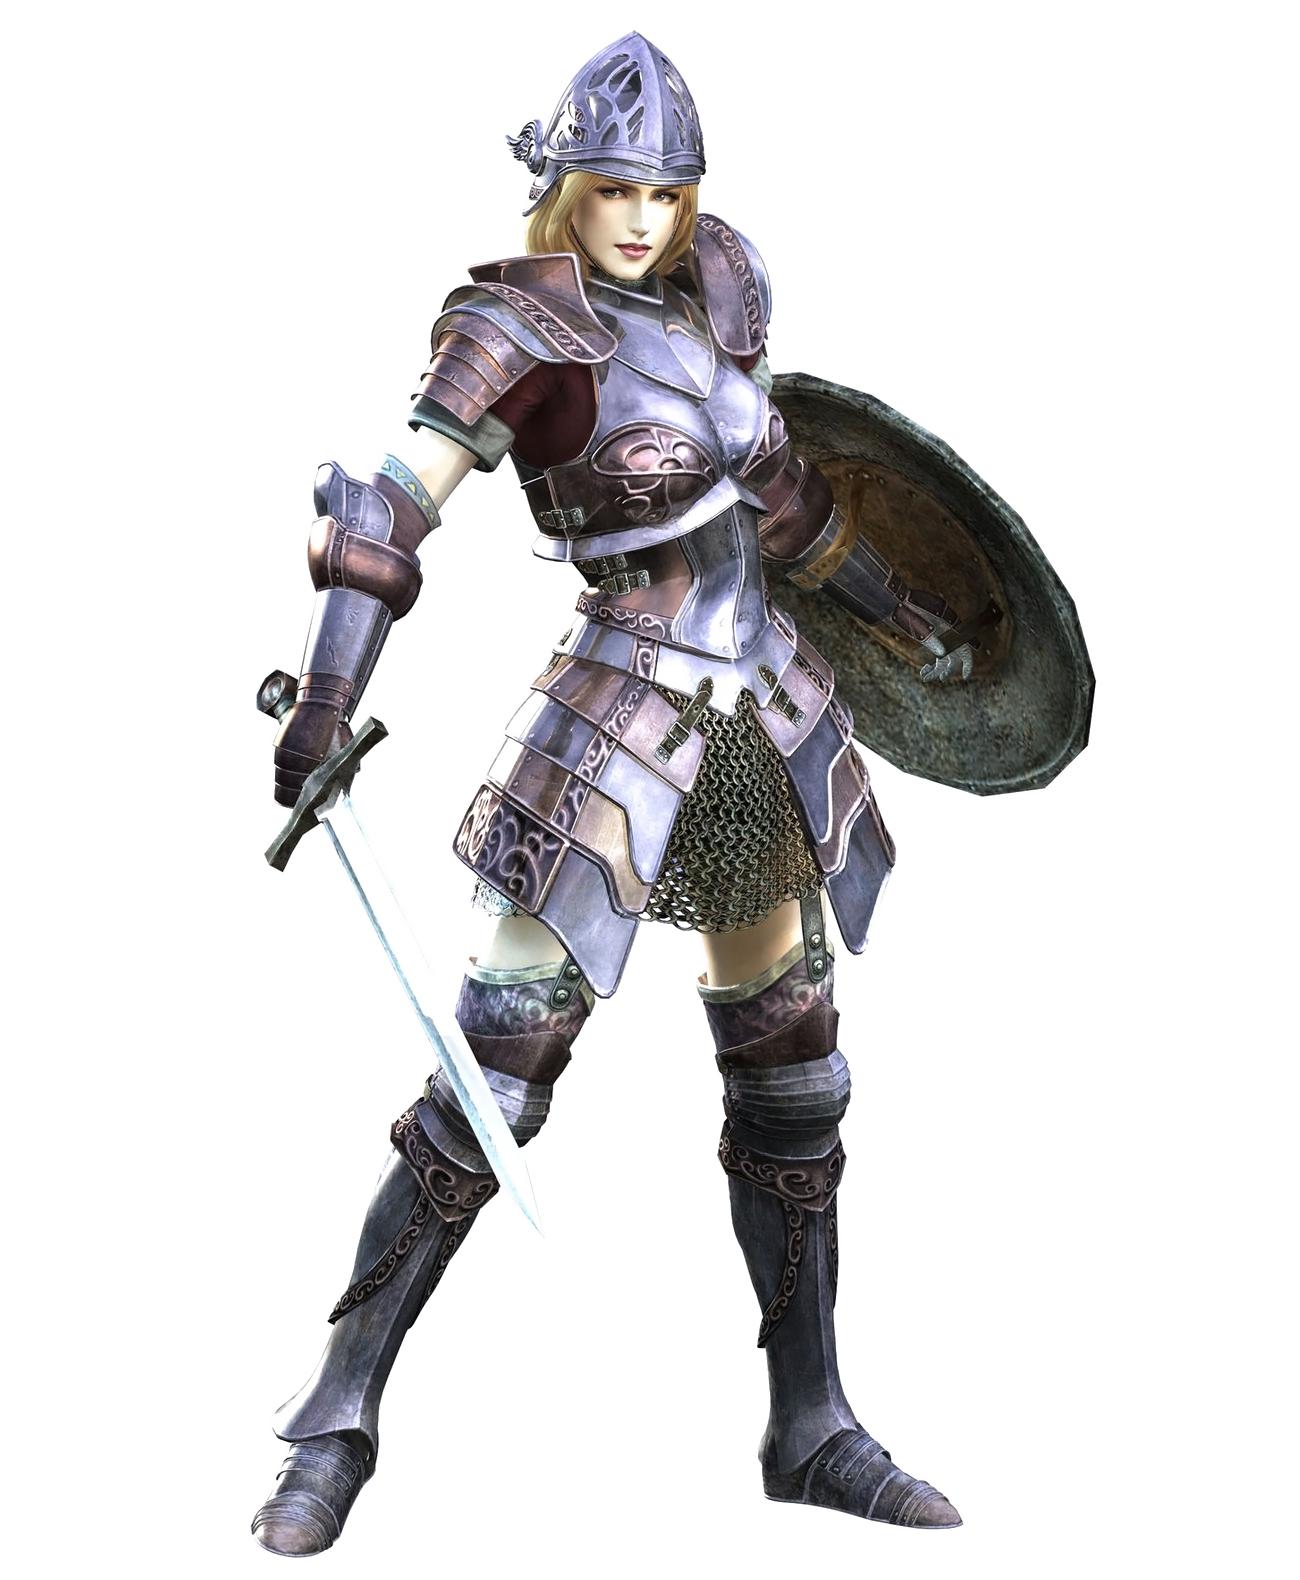 Image - Female Protagonist 1 (BS).jpg